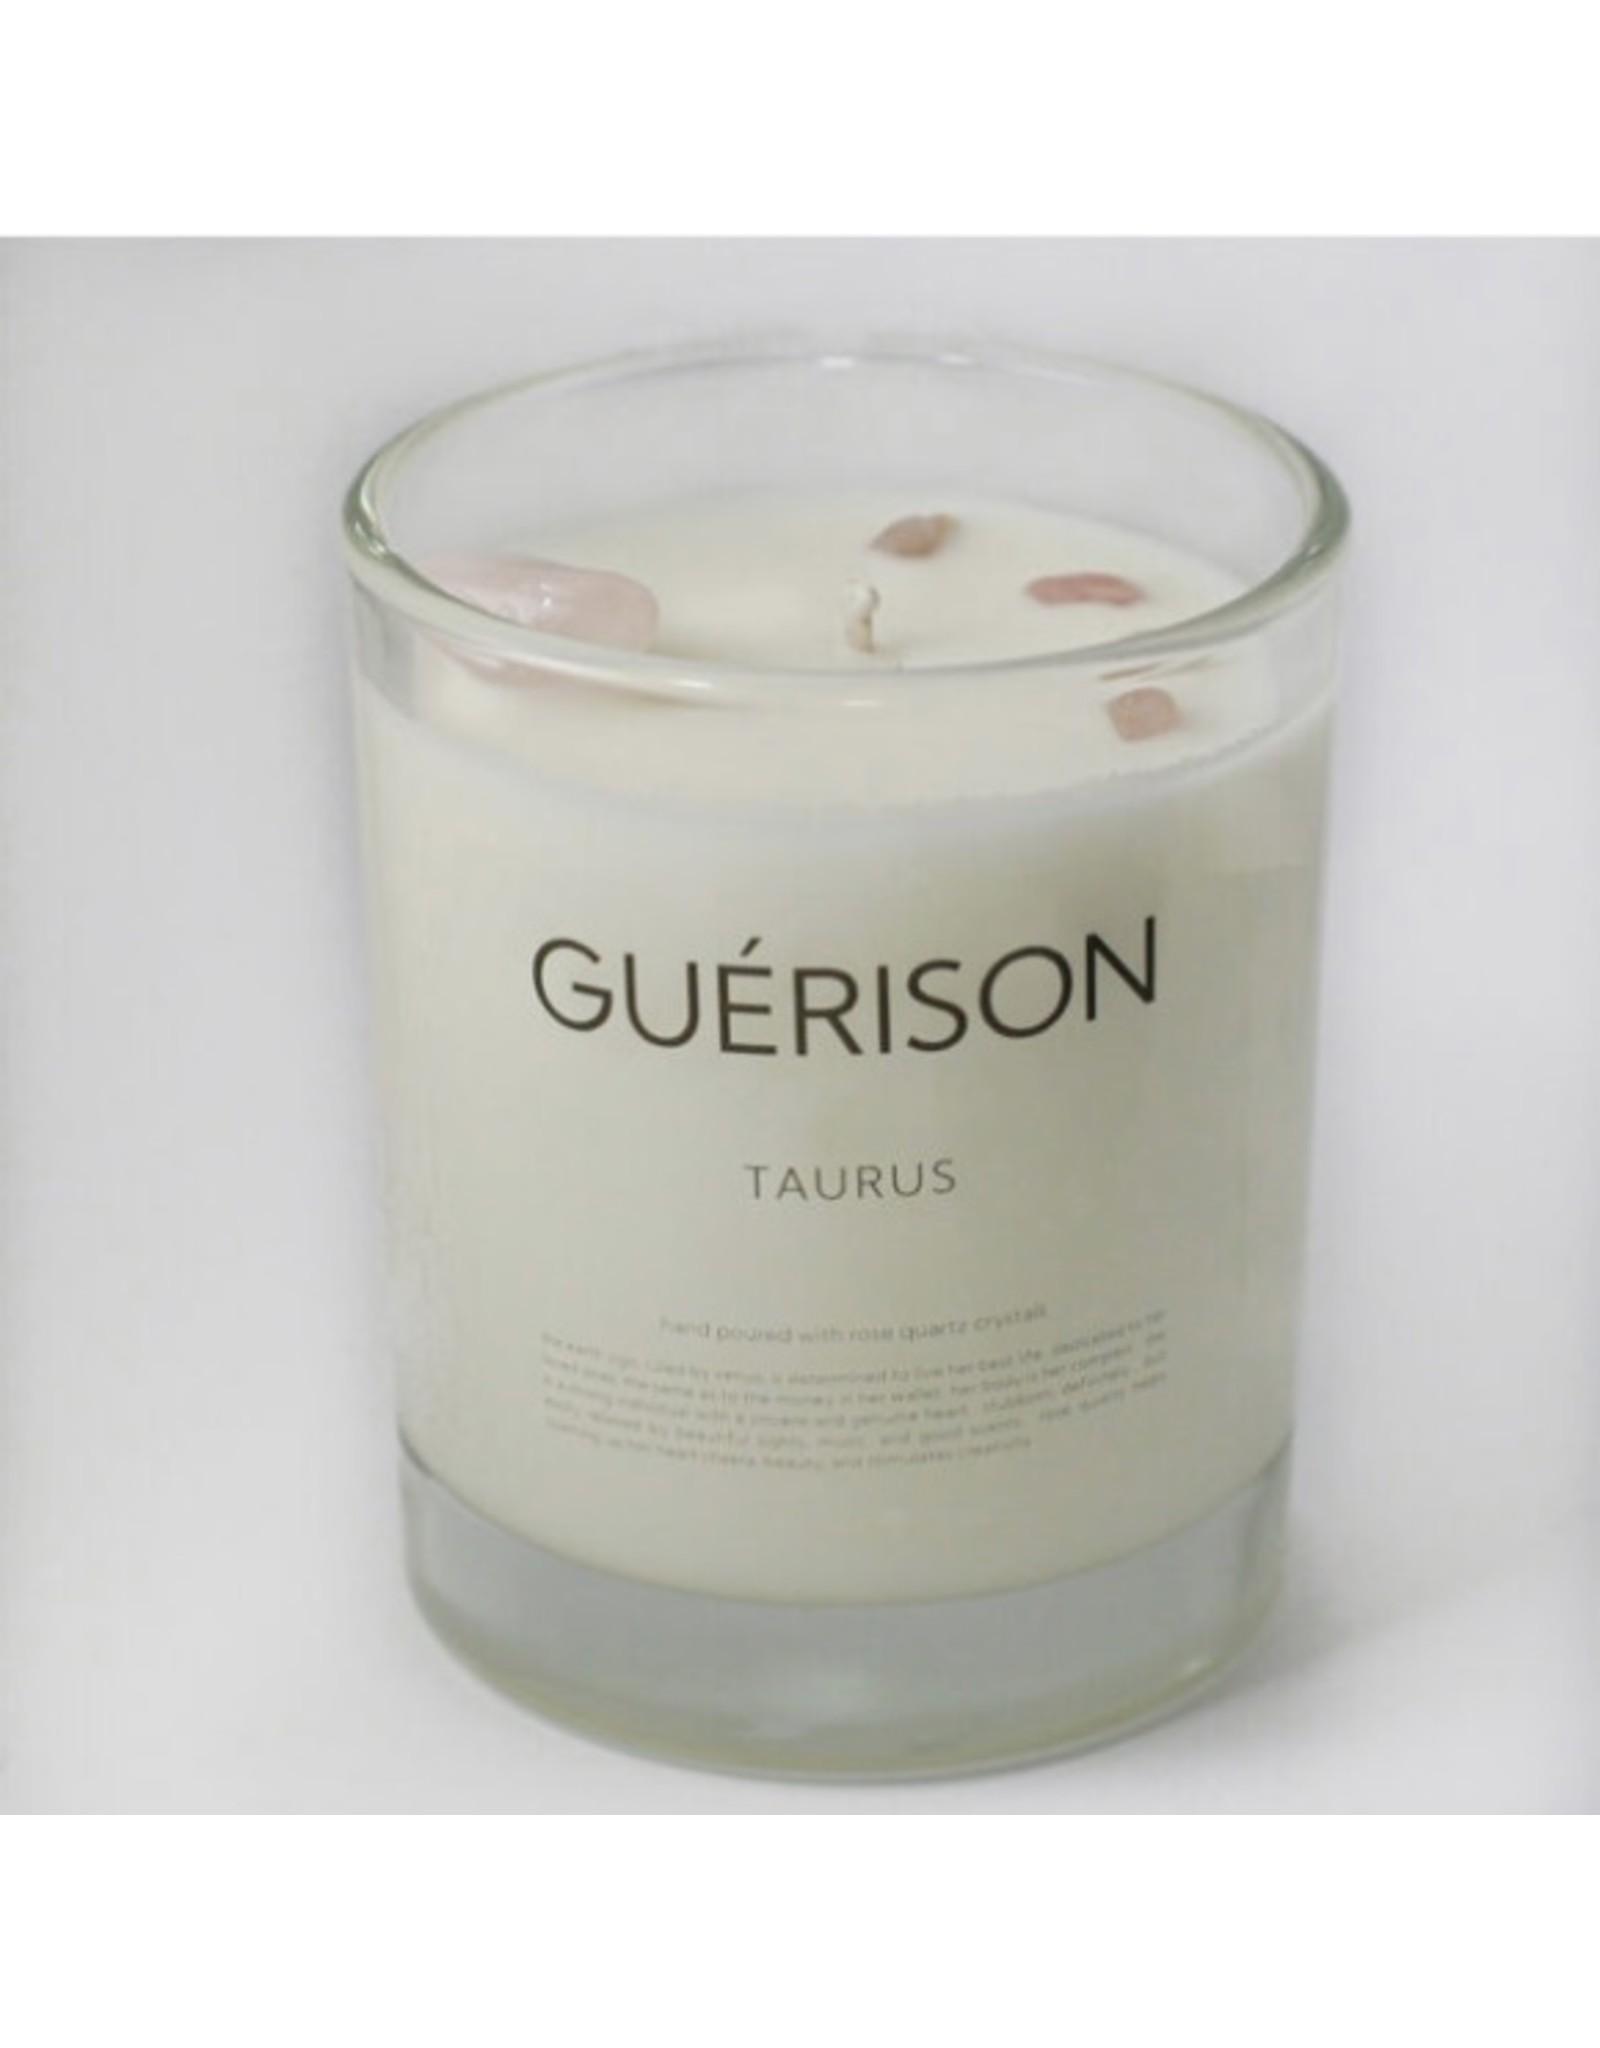 Guérison Taurus Candle, 220g